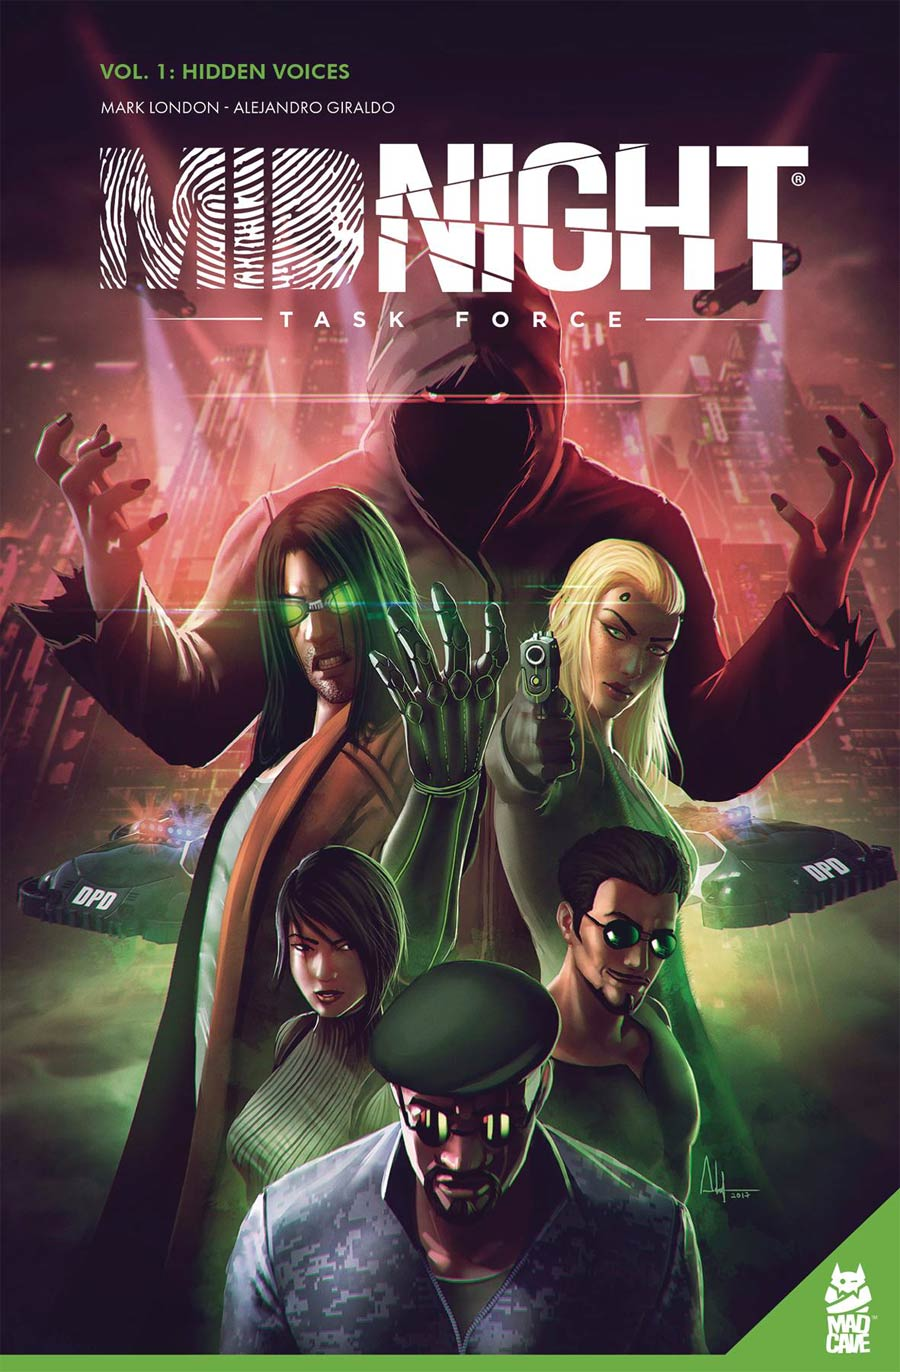 Midnight Task Force Vol 1 Hidden Voices TP